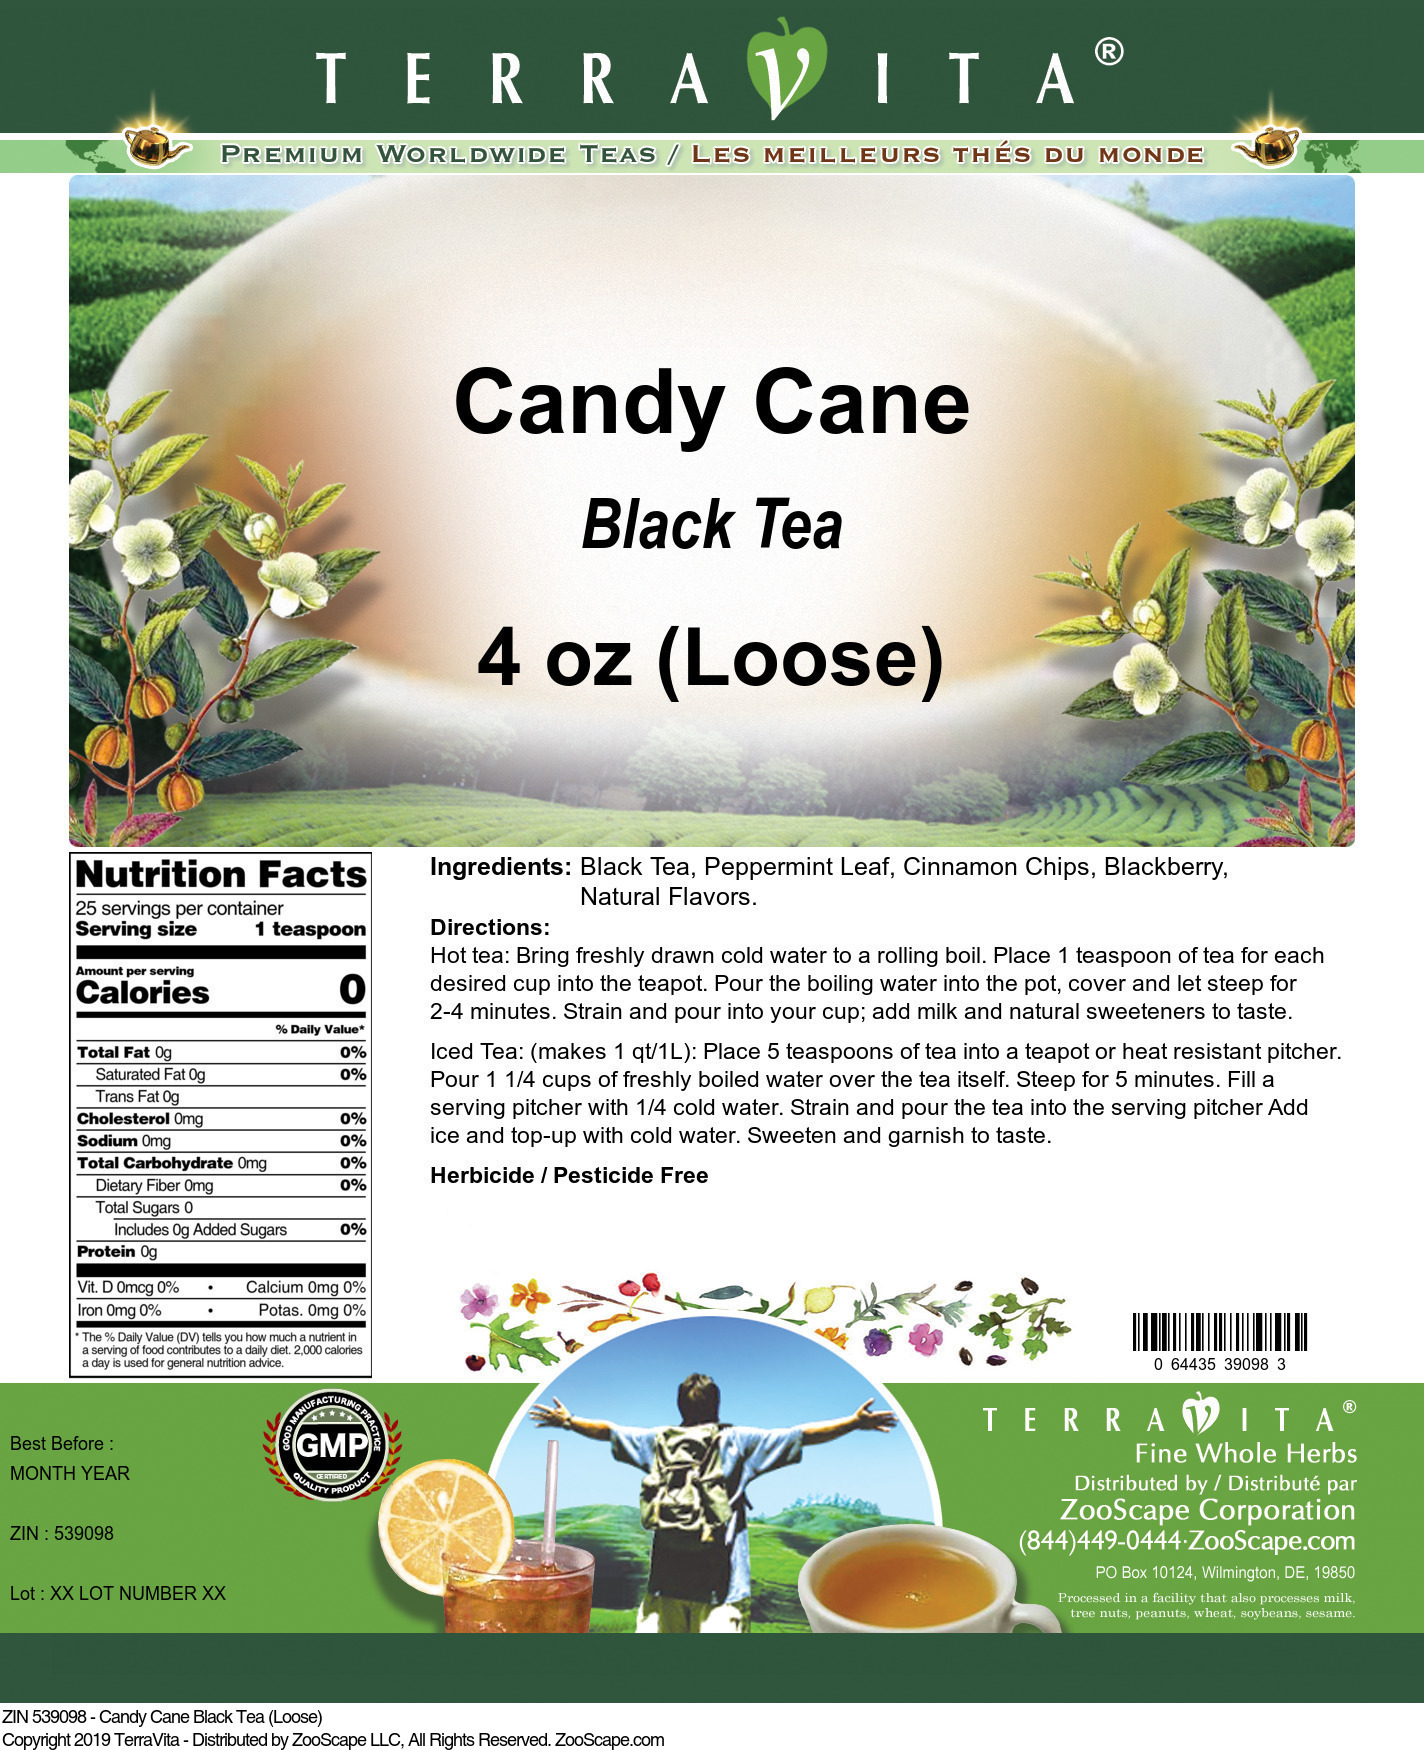 Candy Cane Black Tea (Loose)